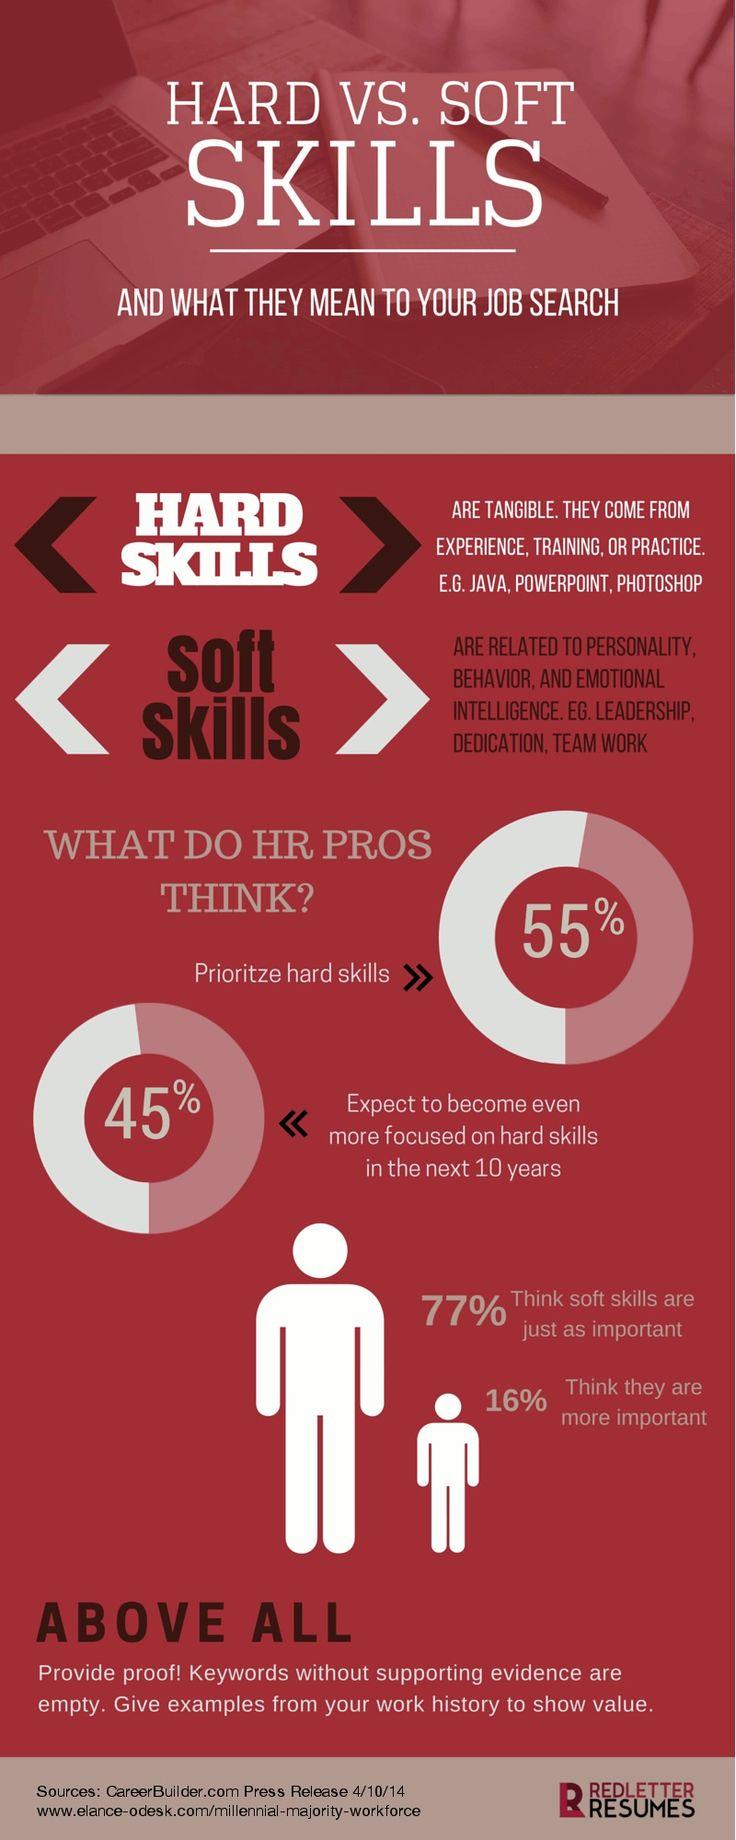 Hard Skills vs Soft Skills What They